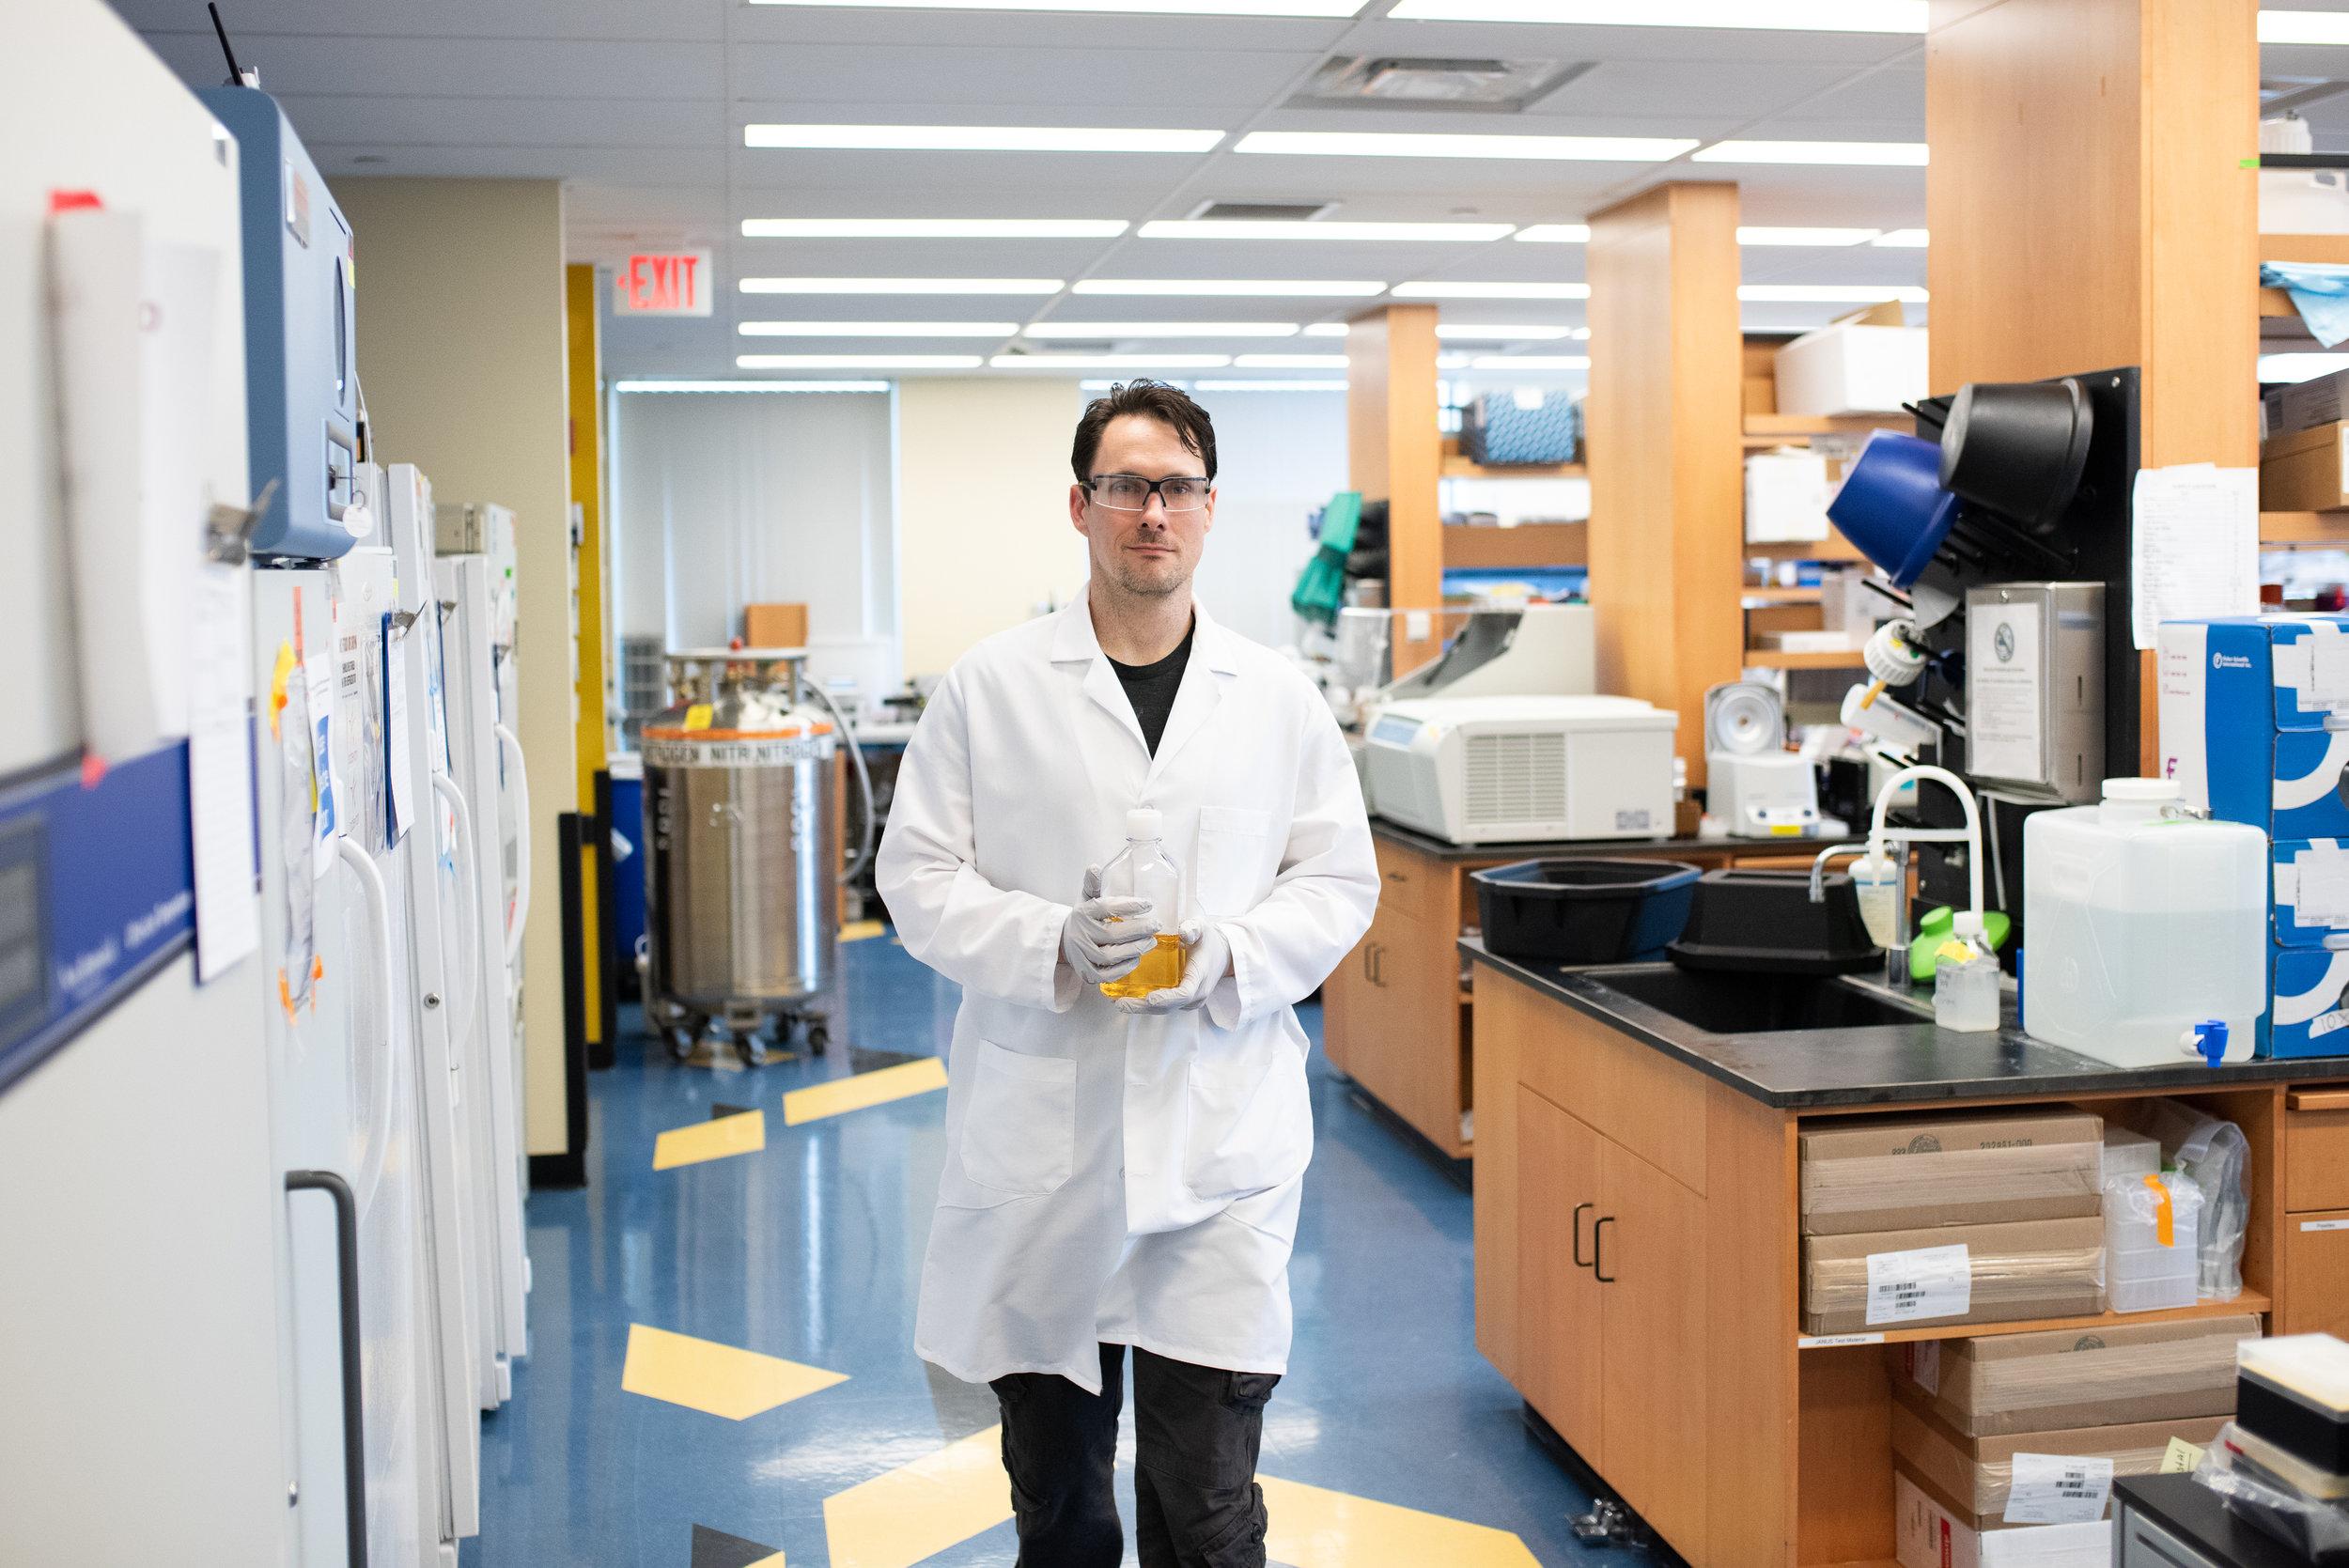 Research Leader in Genocea Lab, Cambridge MA